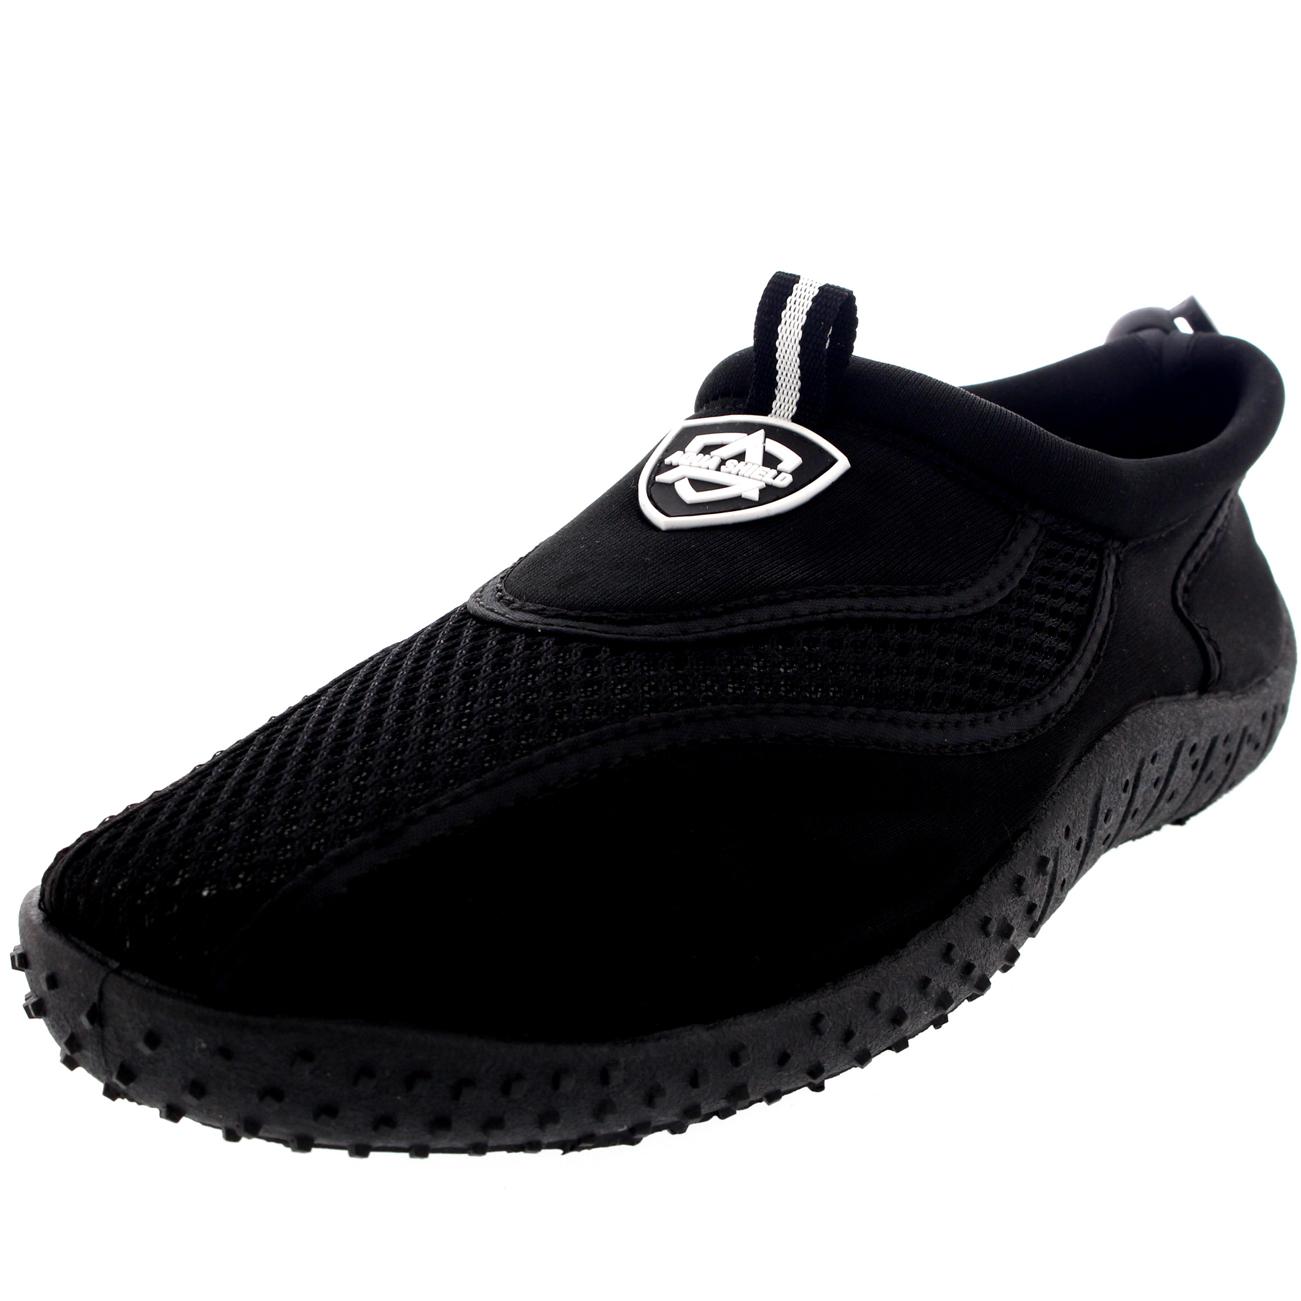 Ladies Beach Yoga Skin Pool River Aquatic Water Sock Slip On Swim Shoe All Sizes Ebay